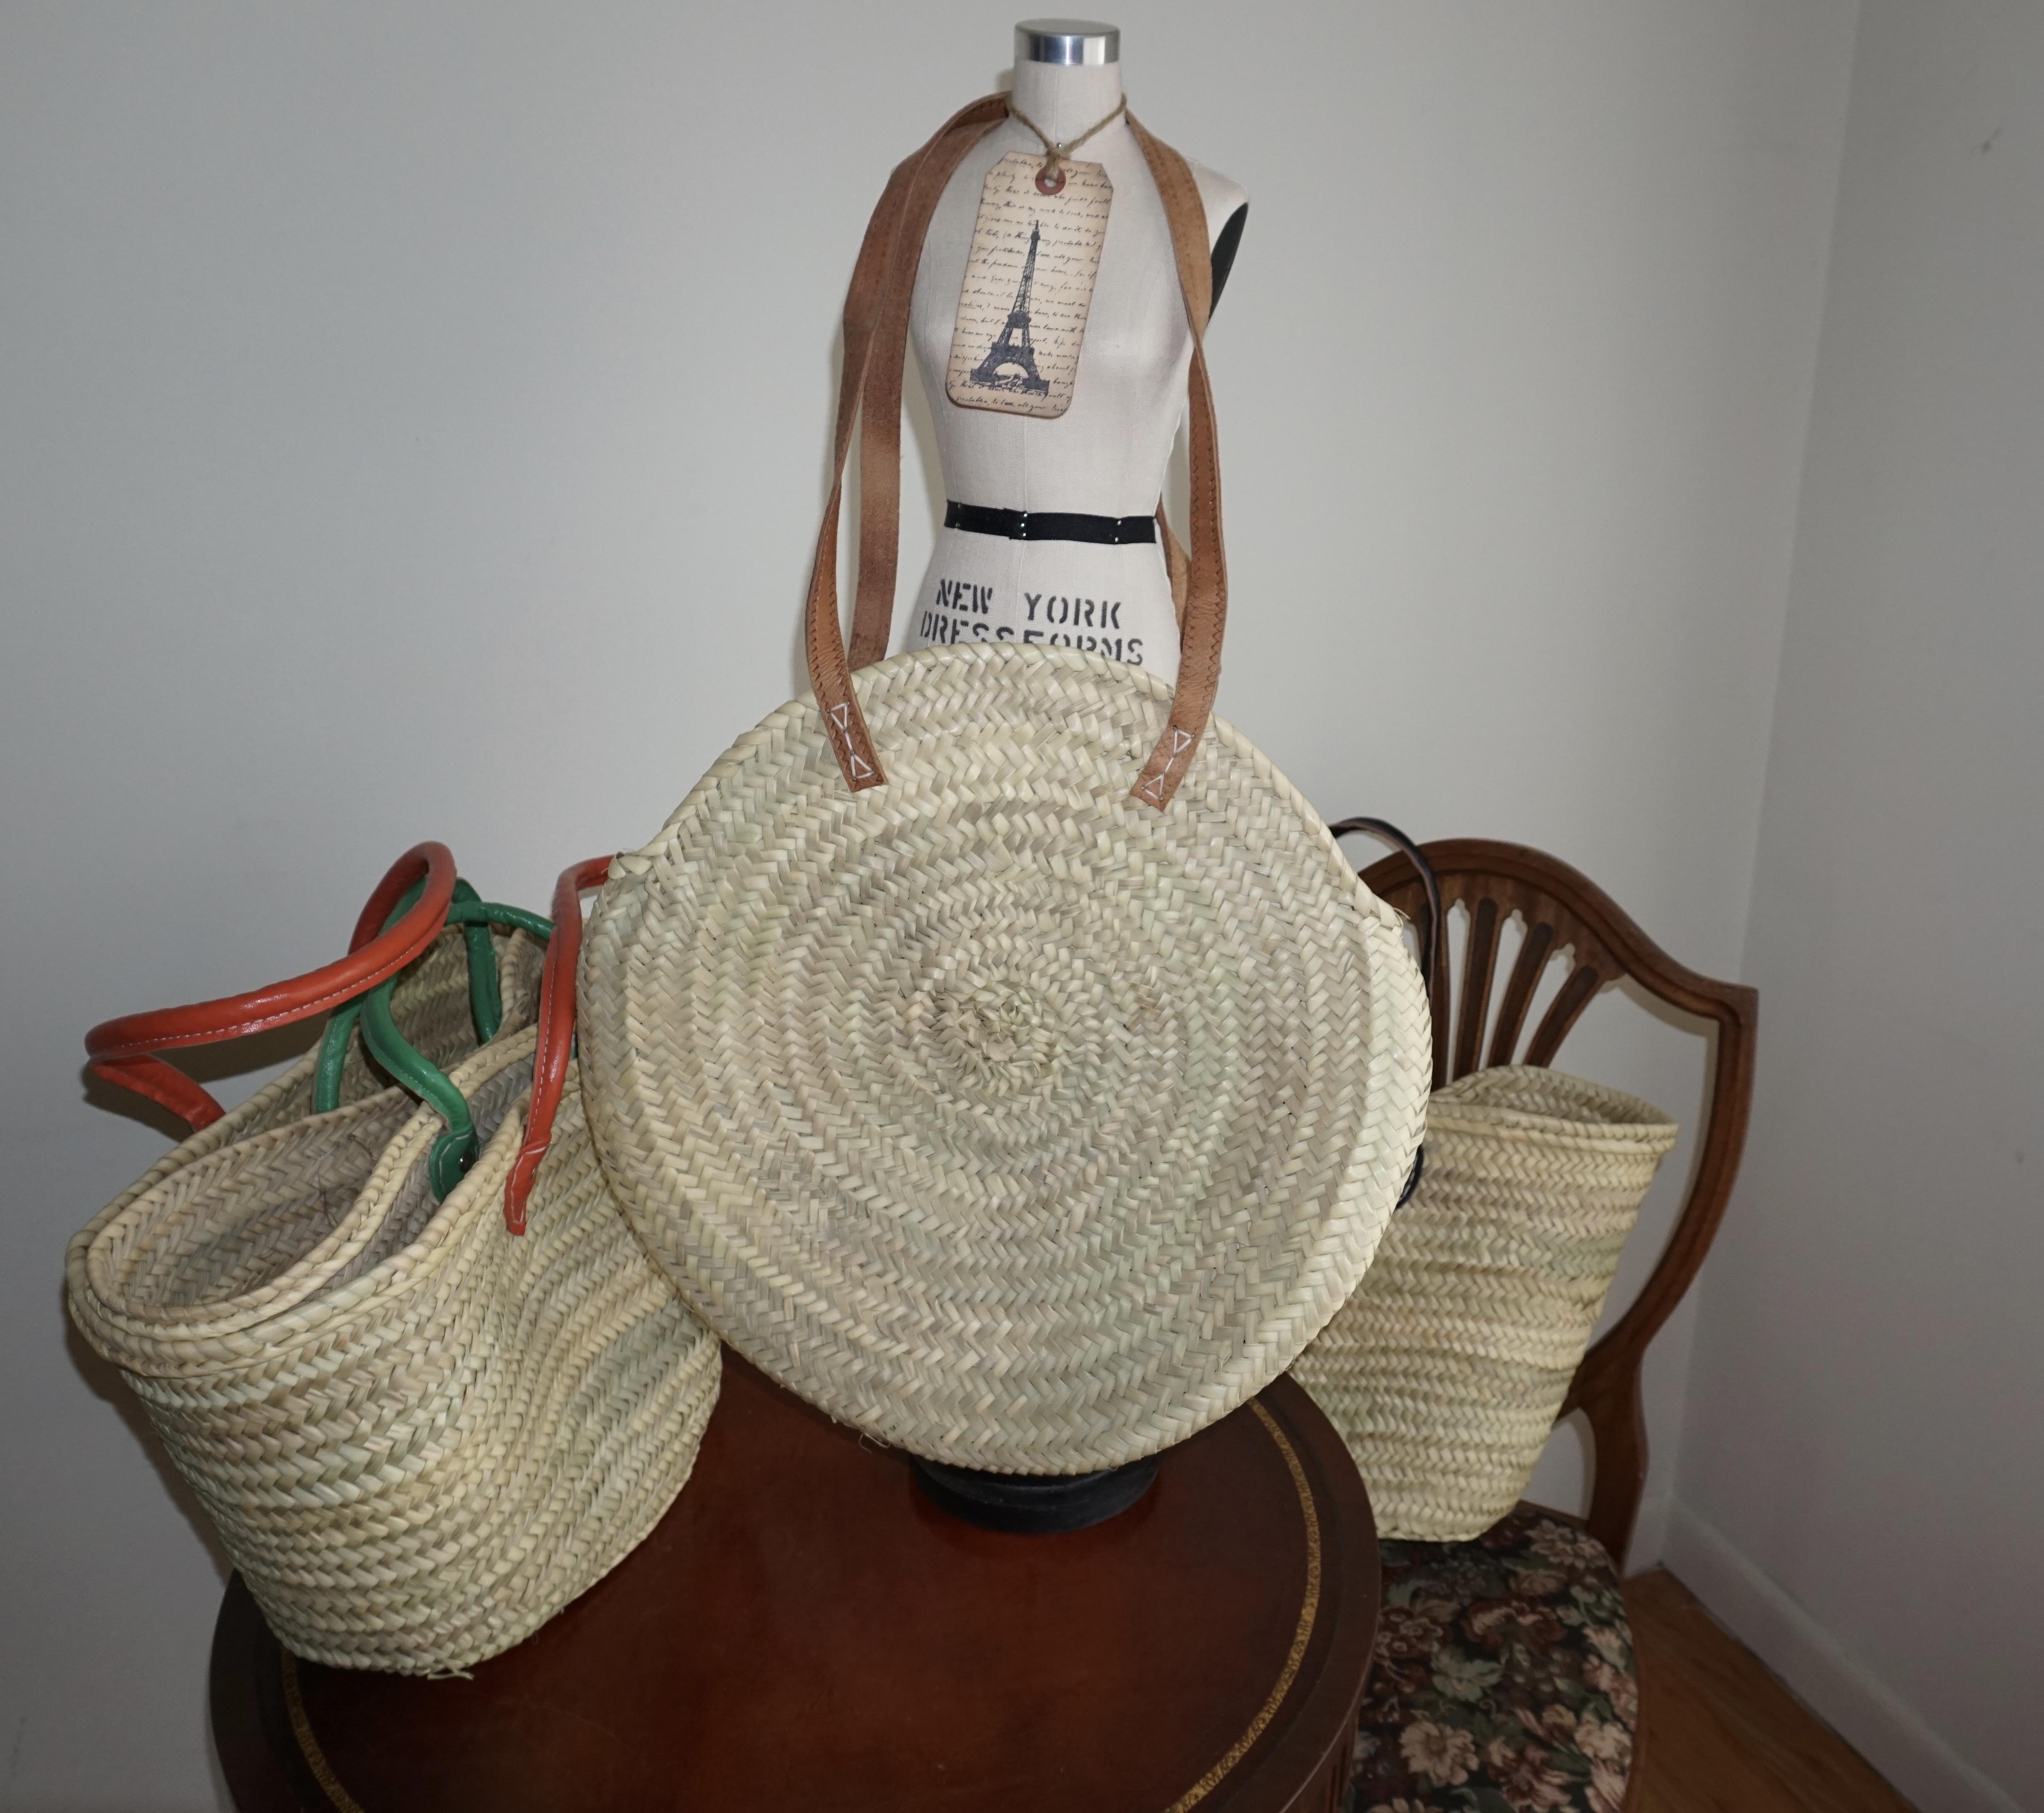 Baskets - French Shopping Baskets